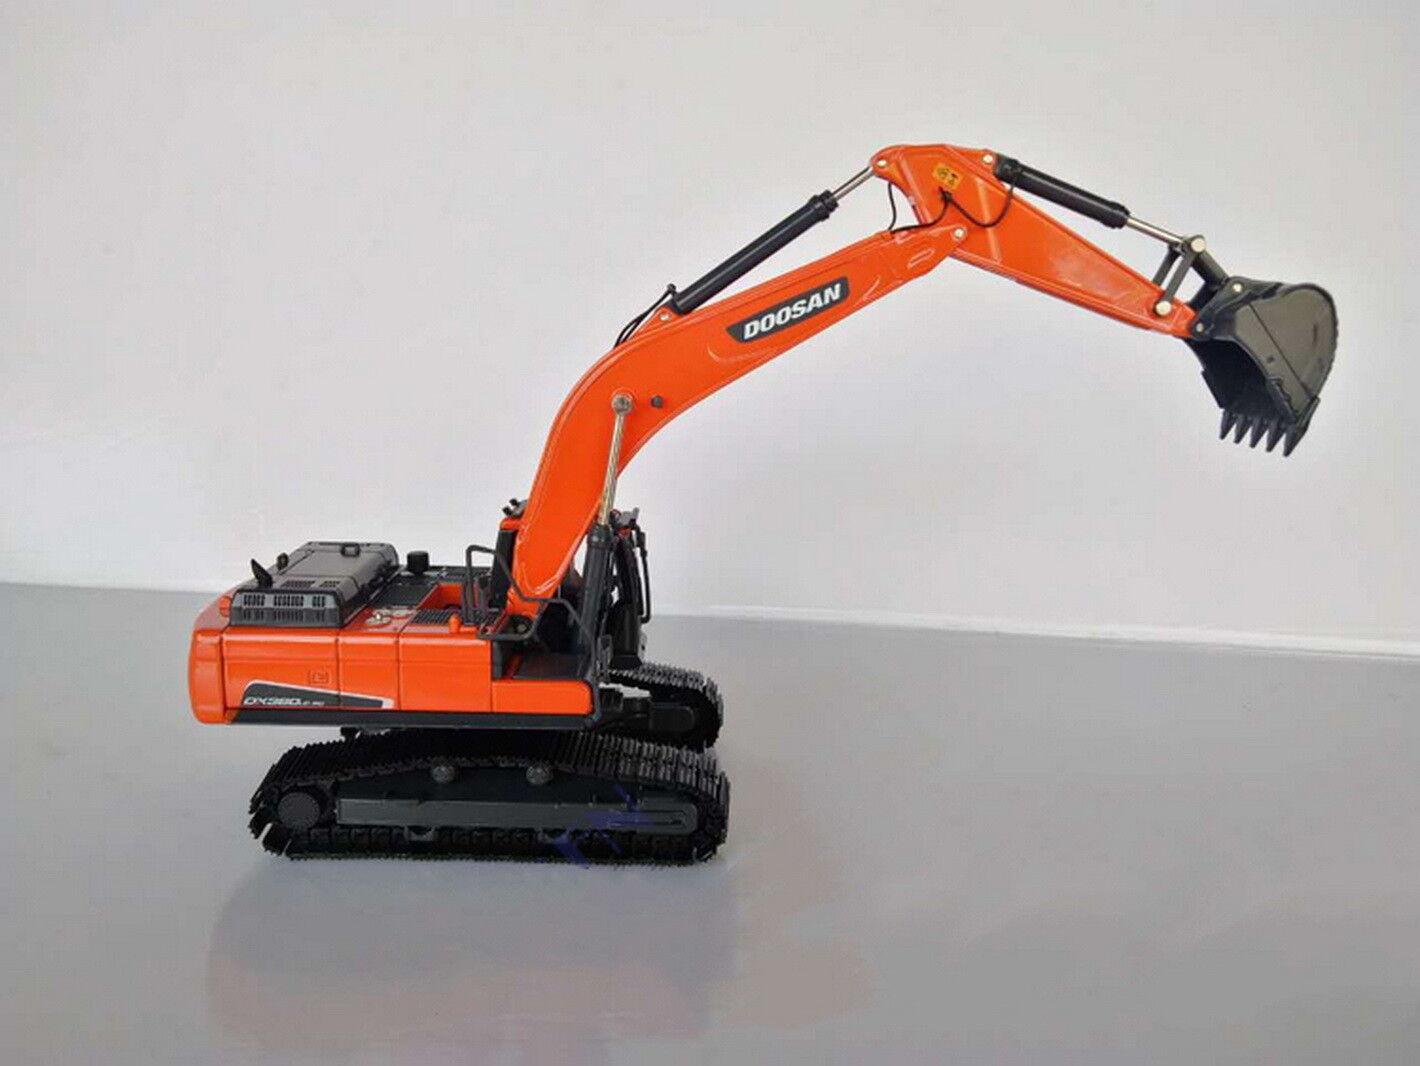 1 50 DOOSAN DX380LC-9C Hydraulic Hydraulic Hydraulic Excavator Engineering Vehicle Diecast Model 95139e